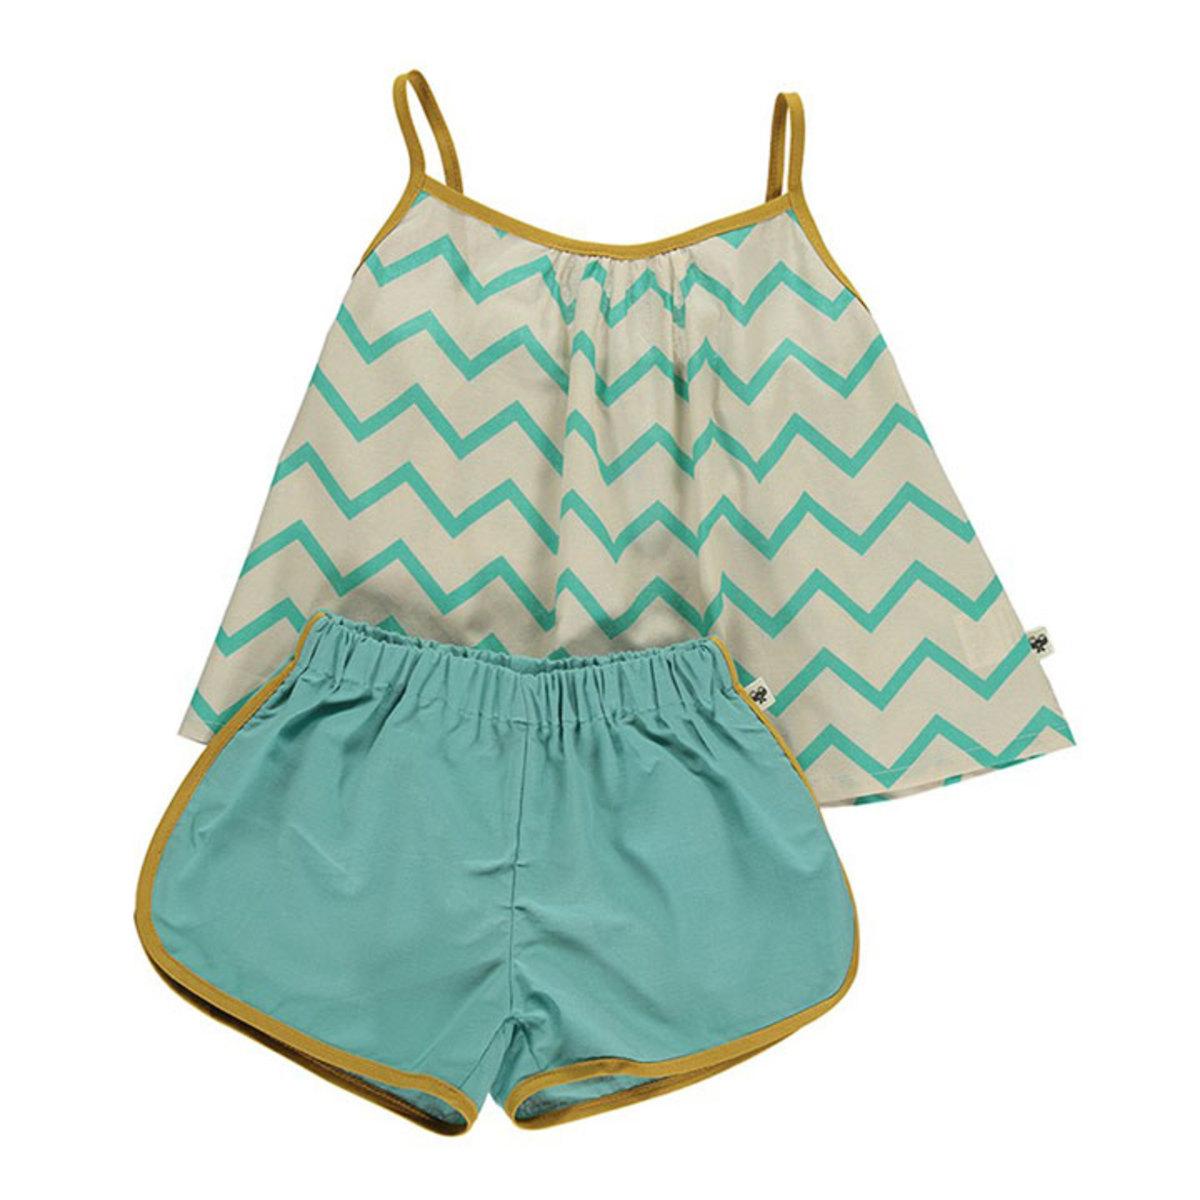 pyjama java zigzag vert 2 ans 2000000083421 achat vente pyjama sur. Black Bedroom Furniture Sets. Home Design Ideas